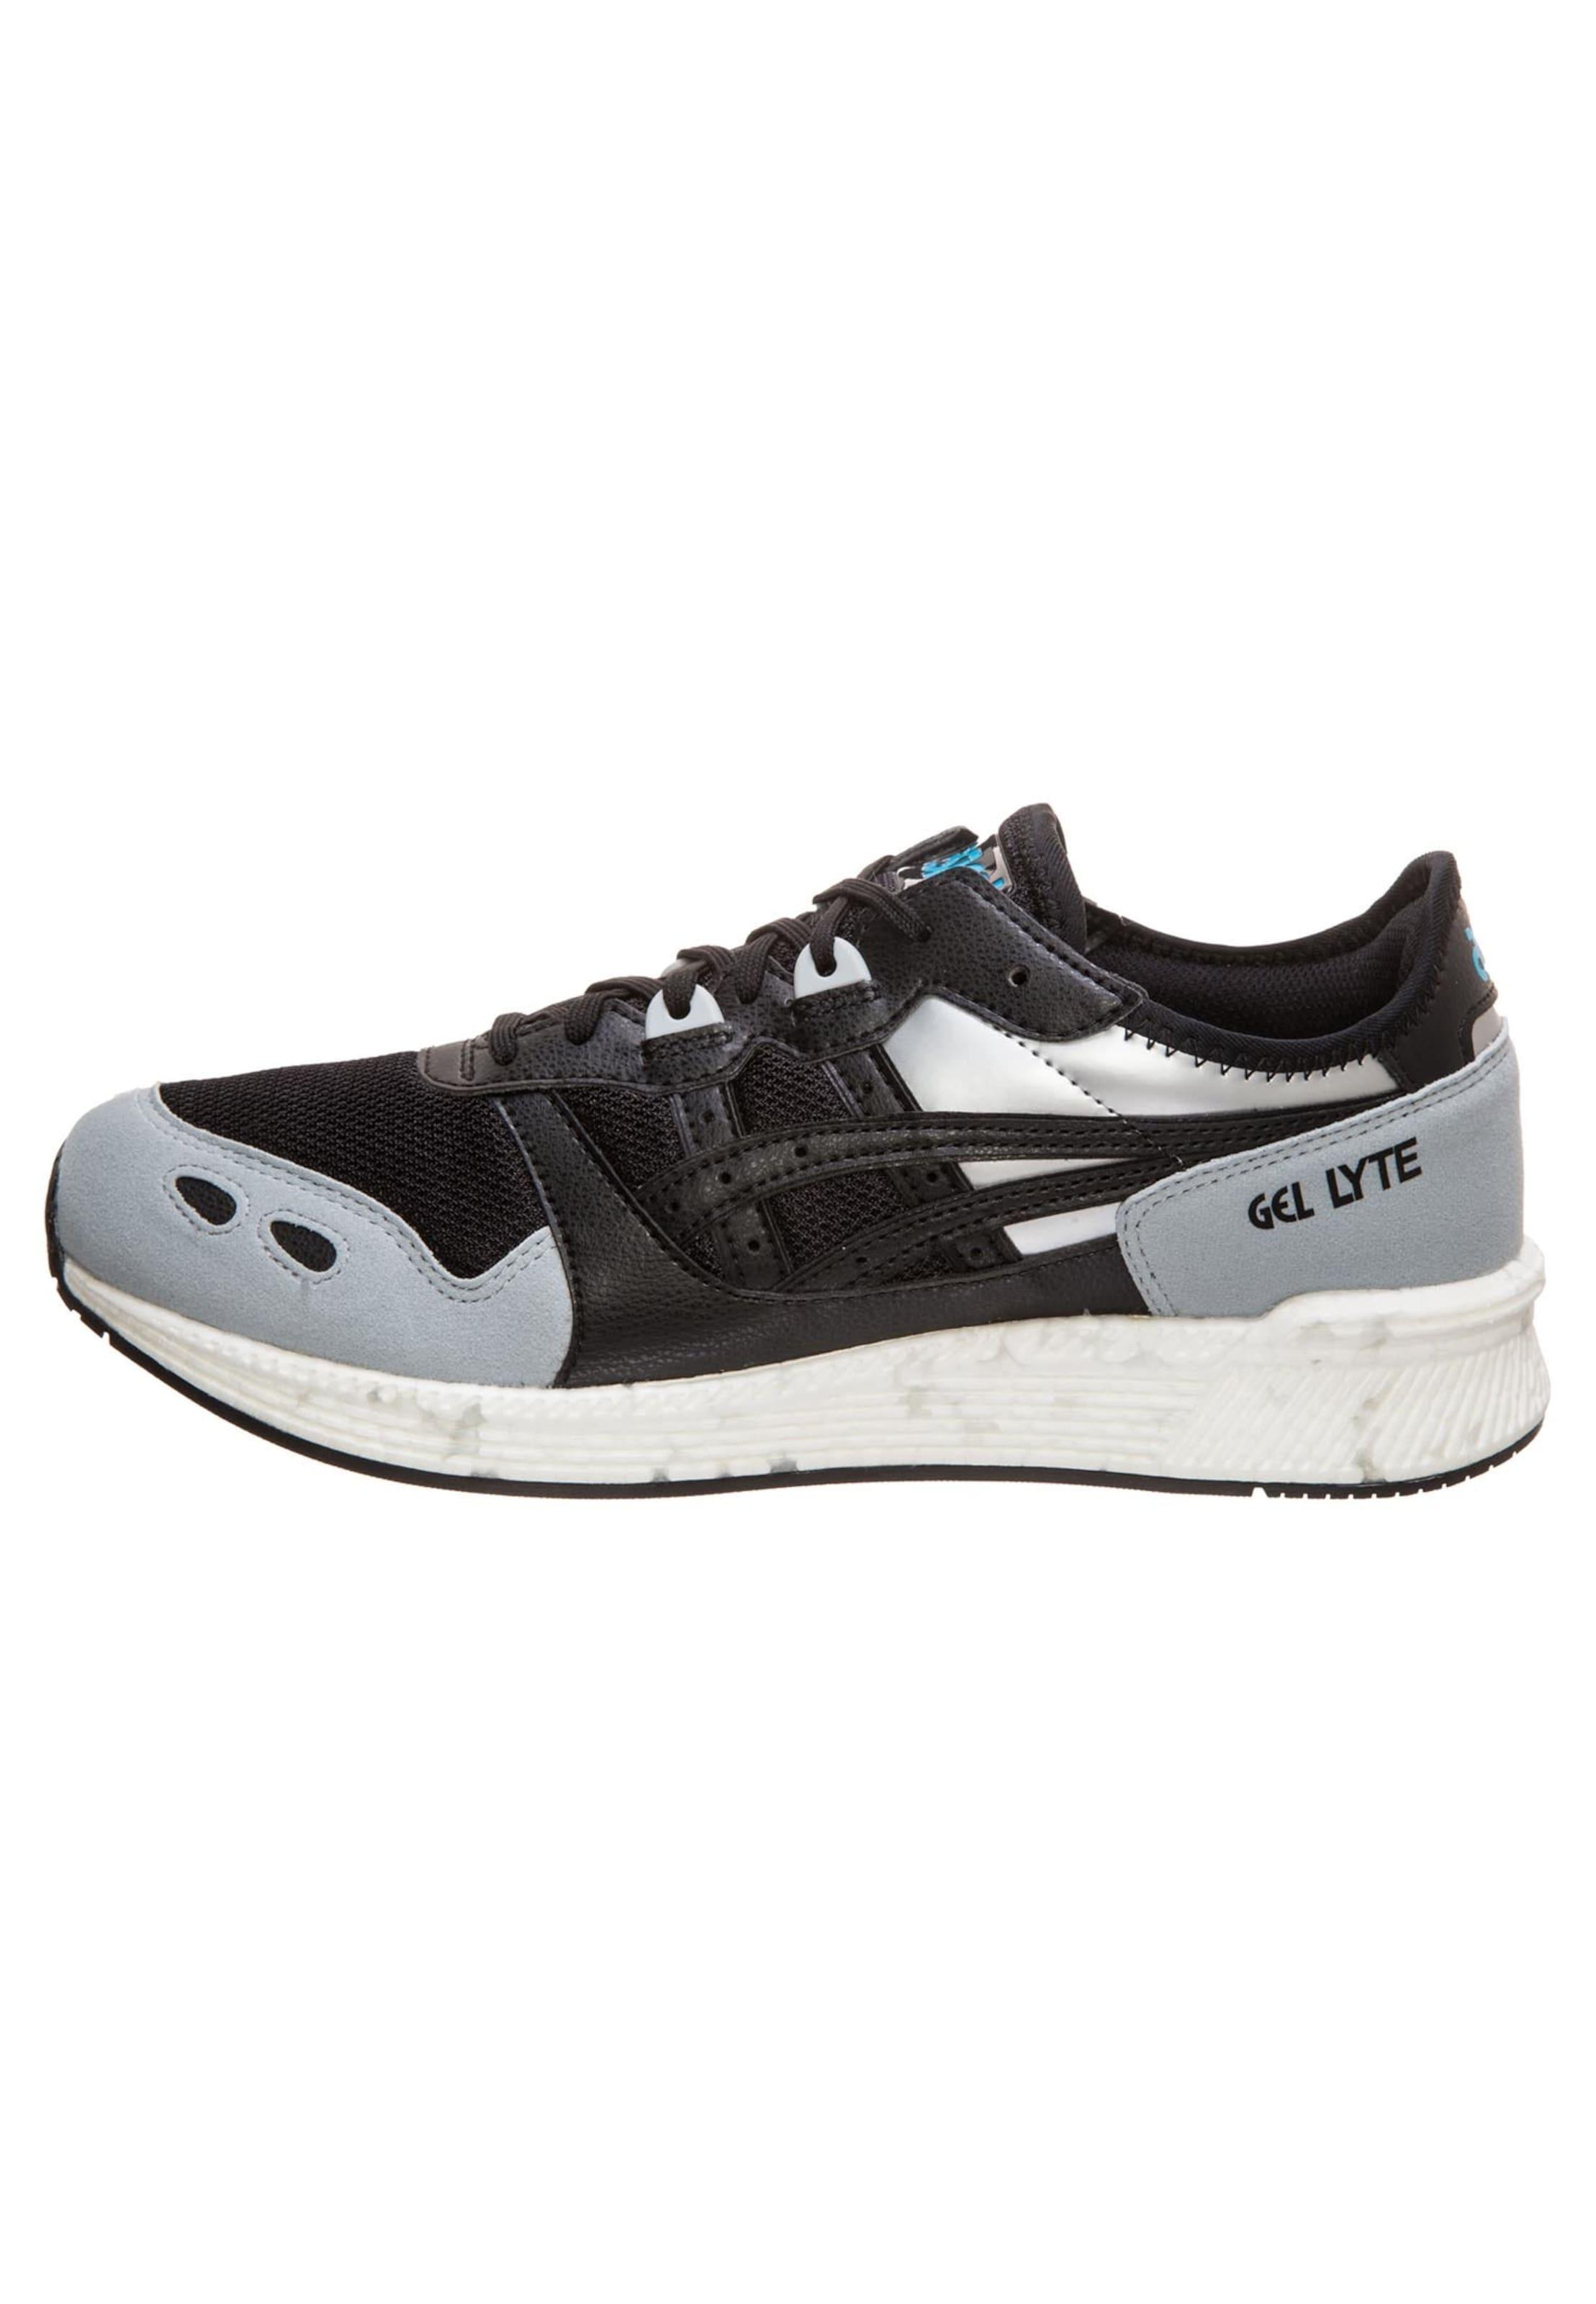 Gel lyte' AquaSchwarz Tiger 'hyper Silber Sneaker Asics In rCsQdxth